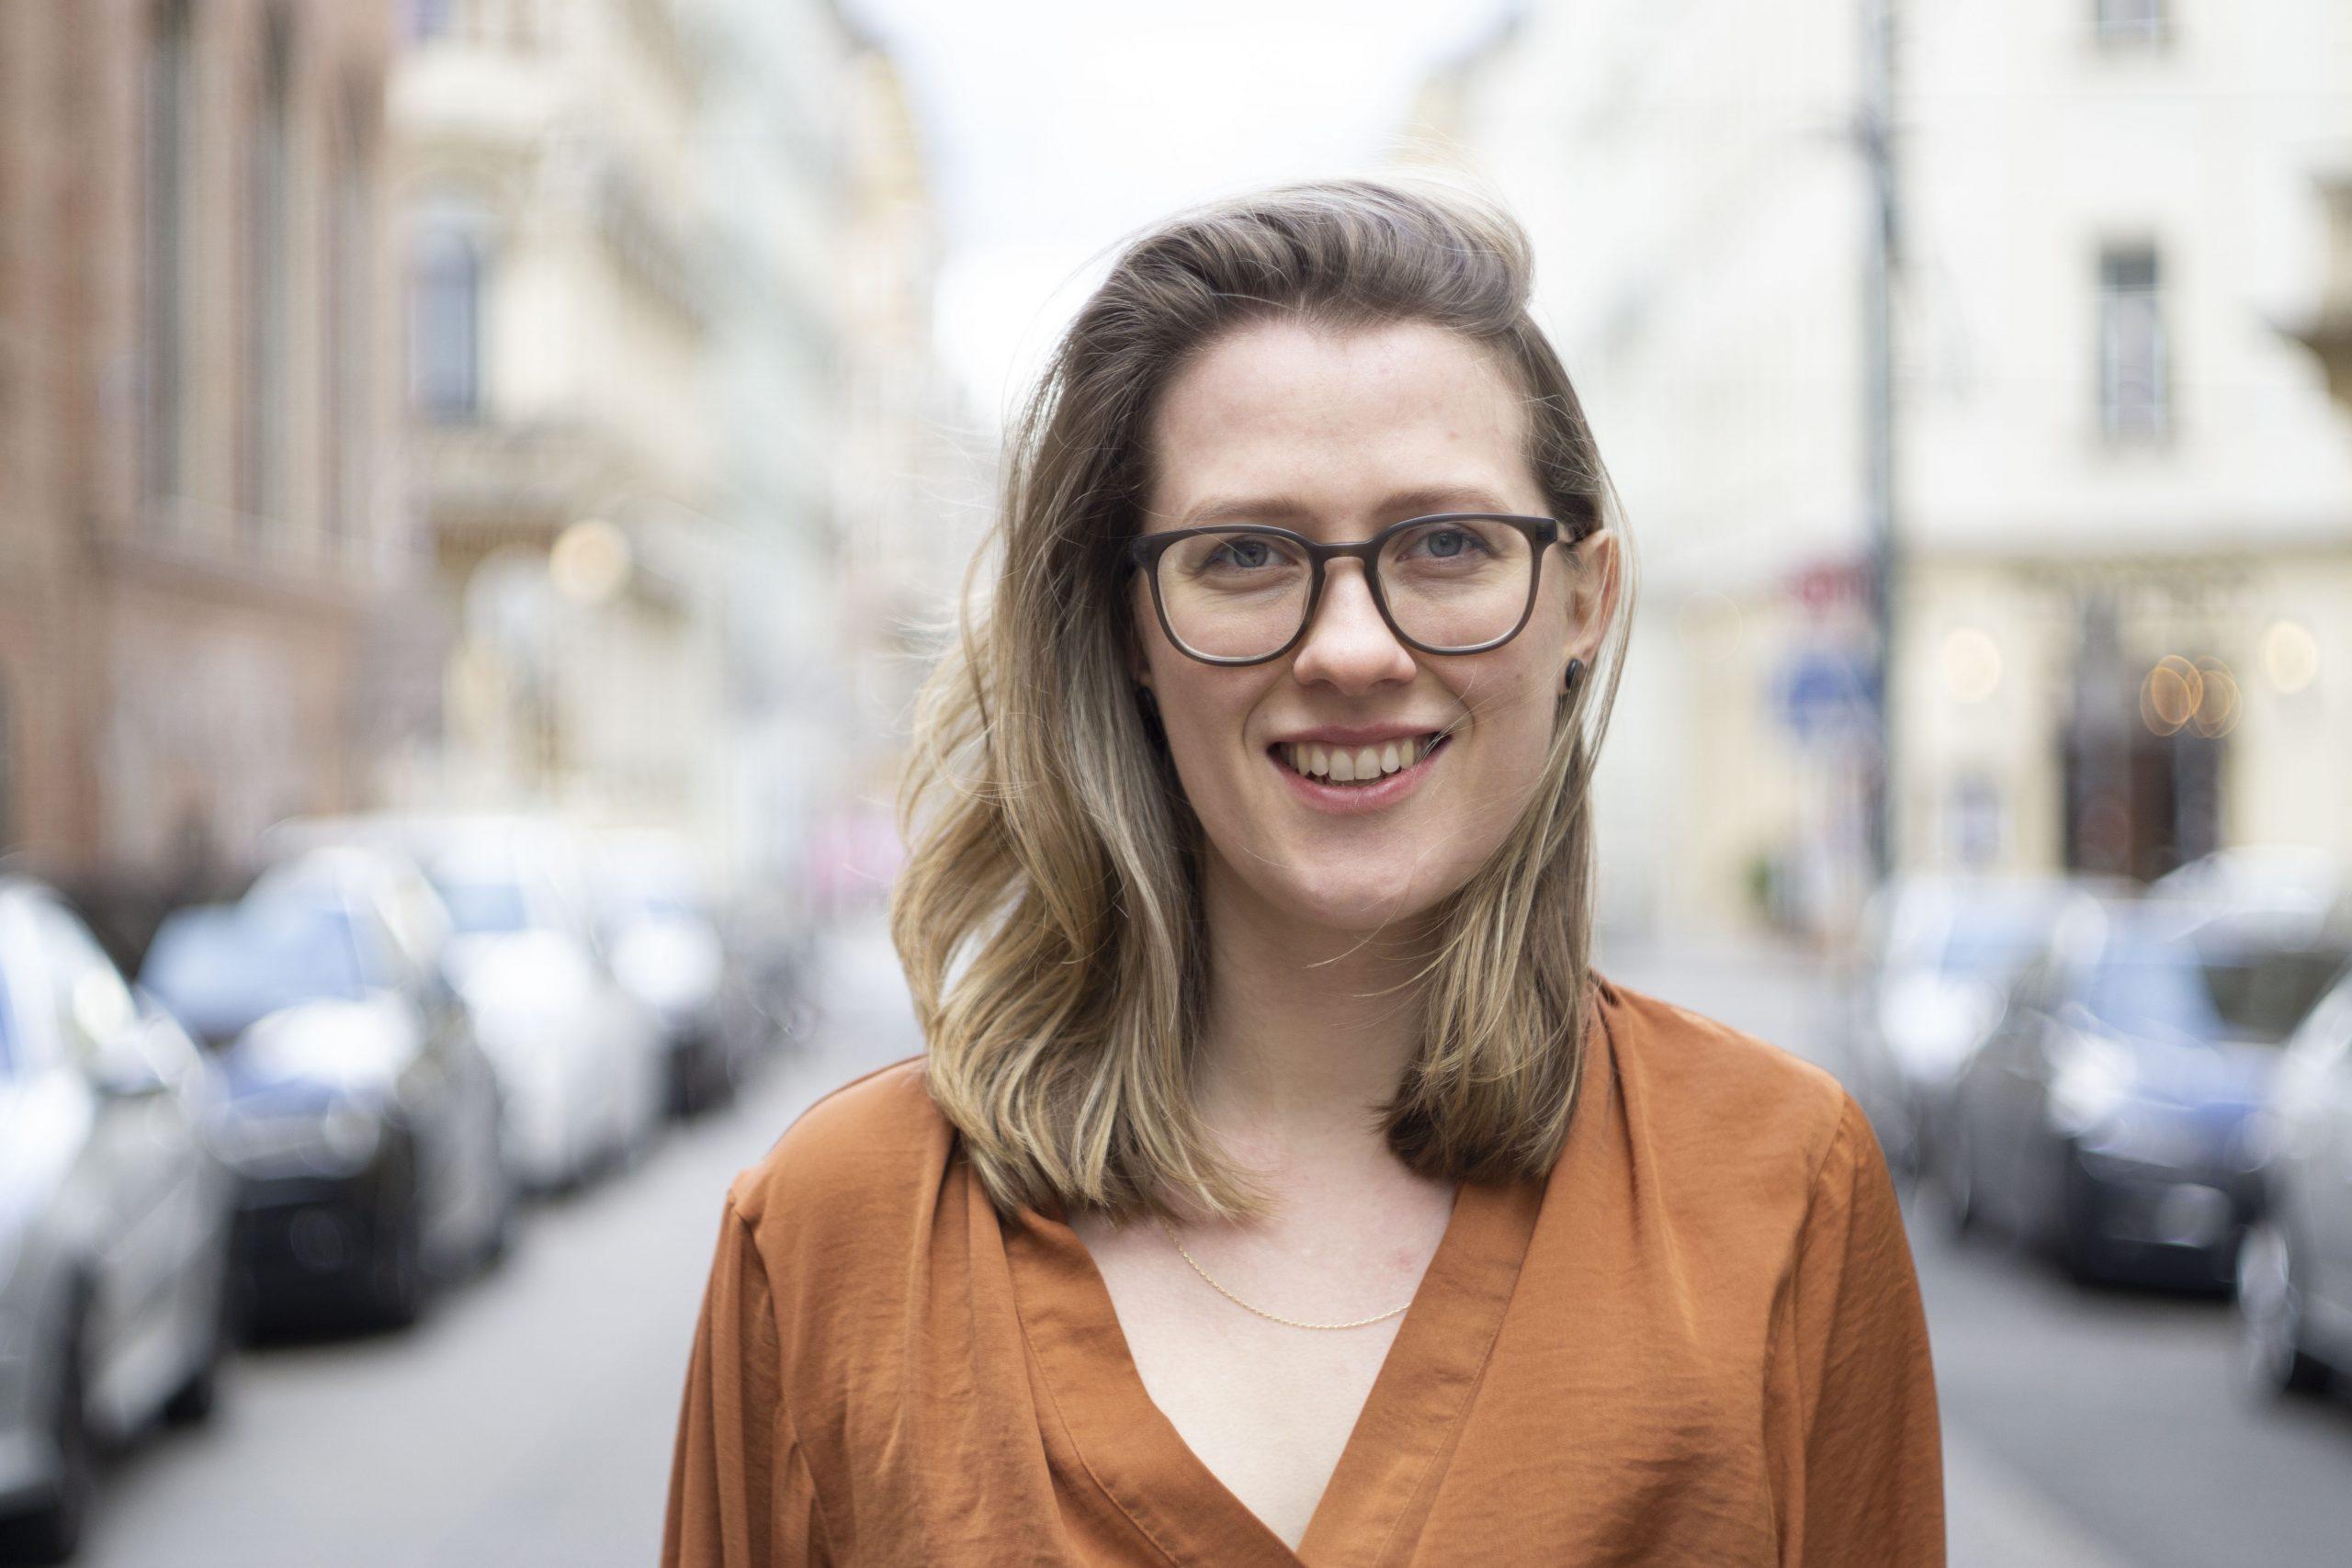 Livia Teubersen von Livt in der Wiener Innenstadt